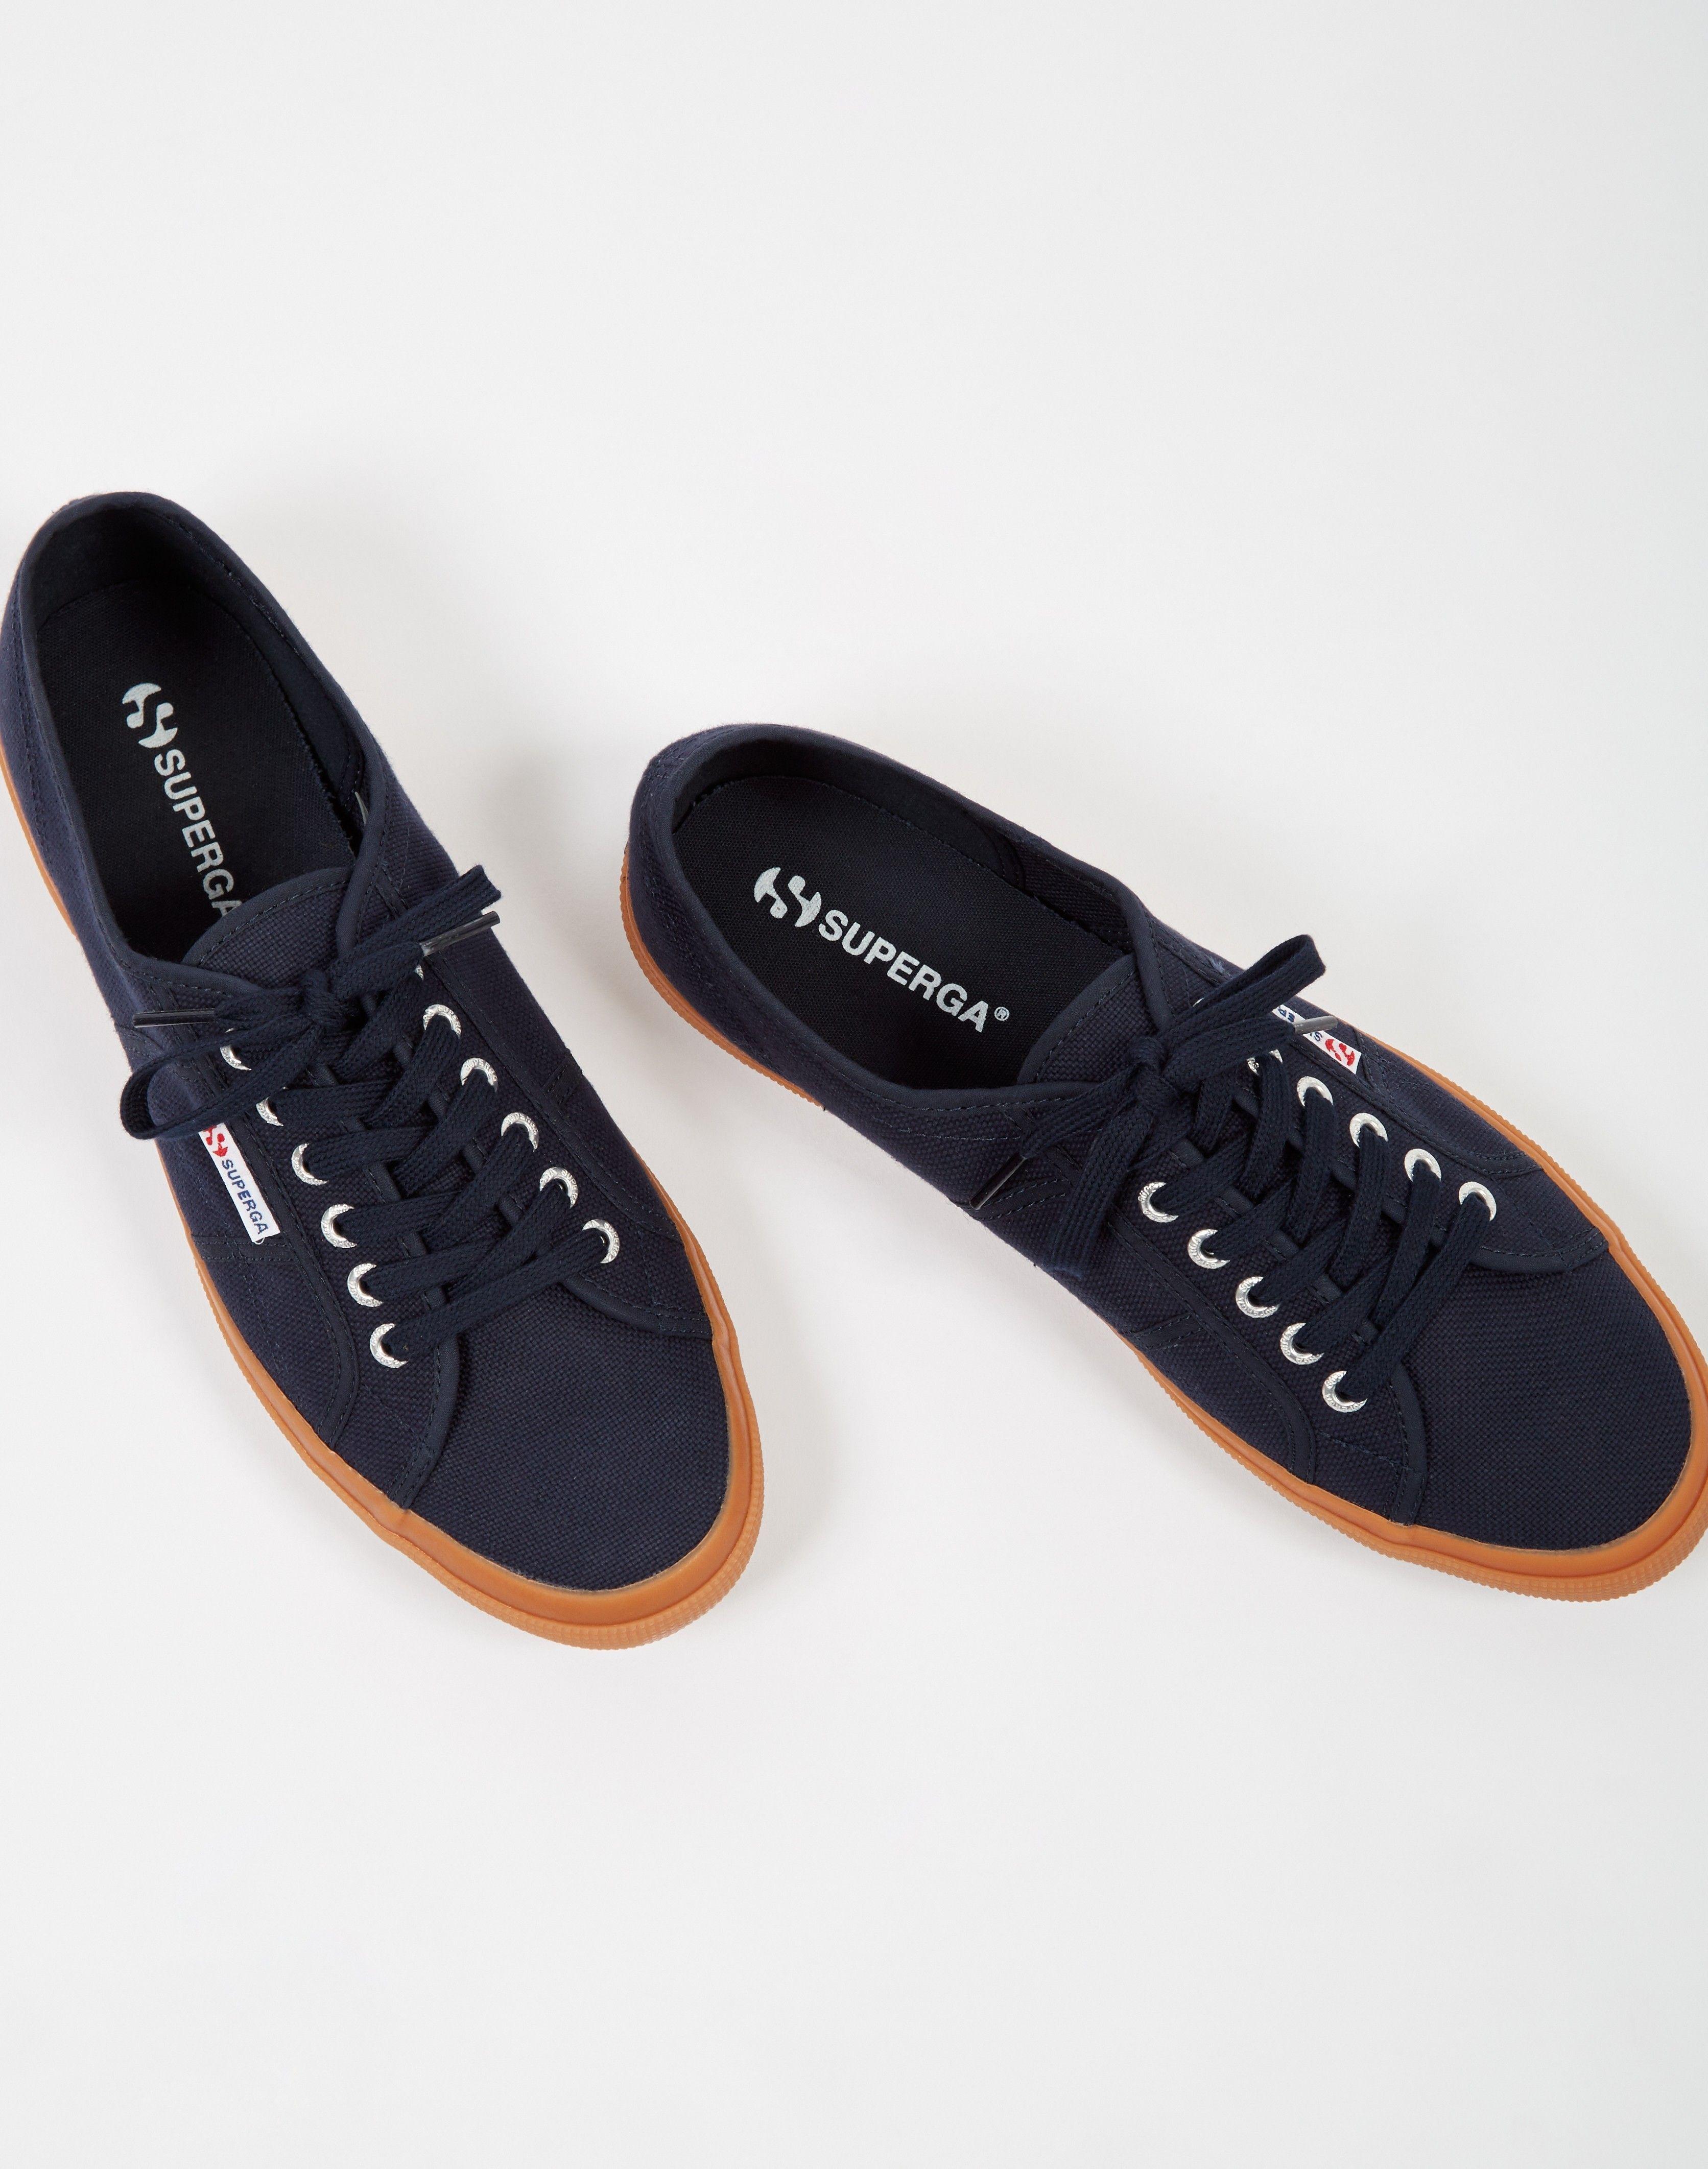 c0ff47e1989fa7 Superga 2750 COTU Classic Navy Gum Sole - Trainers   Plimsolls - Shoes -  Shop at The Idle Man